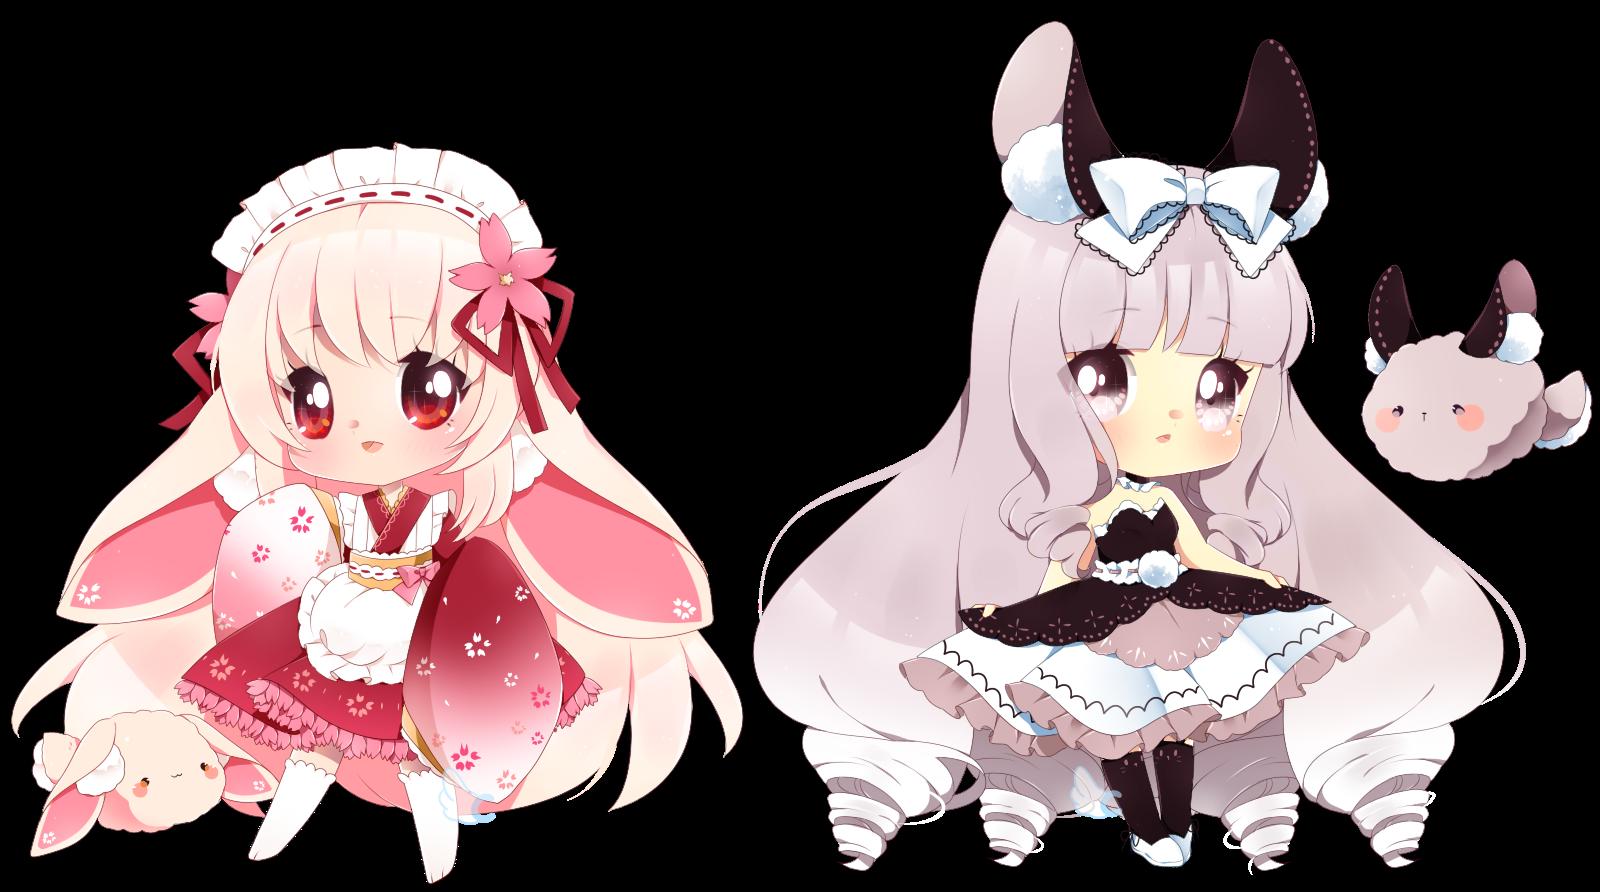 RLC: Yoonsi and Minnisu by cutesu